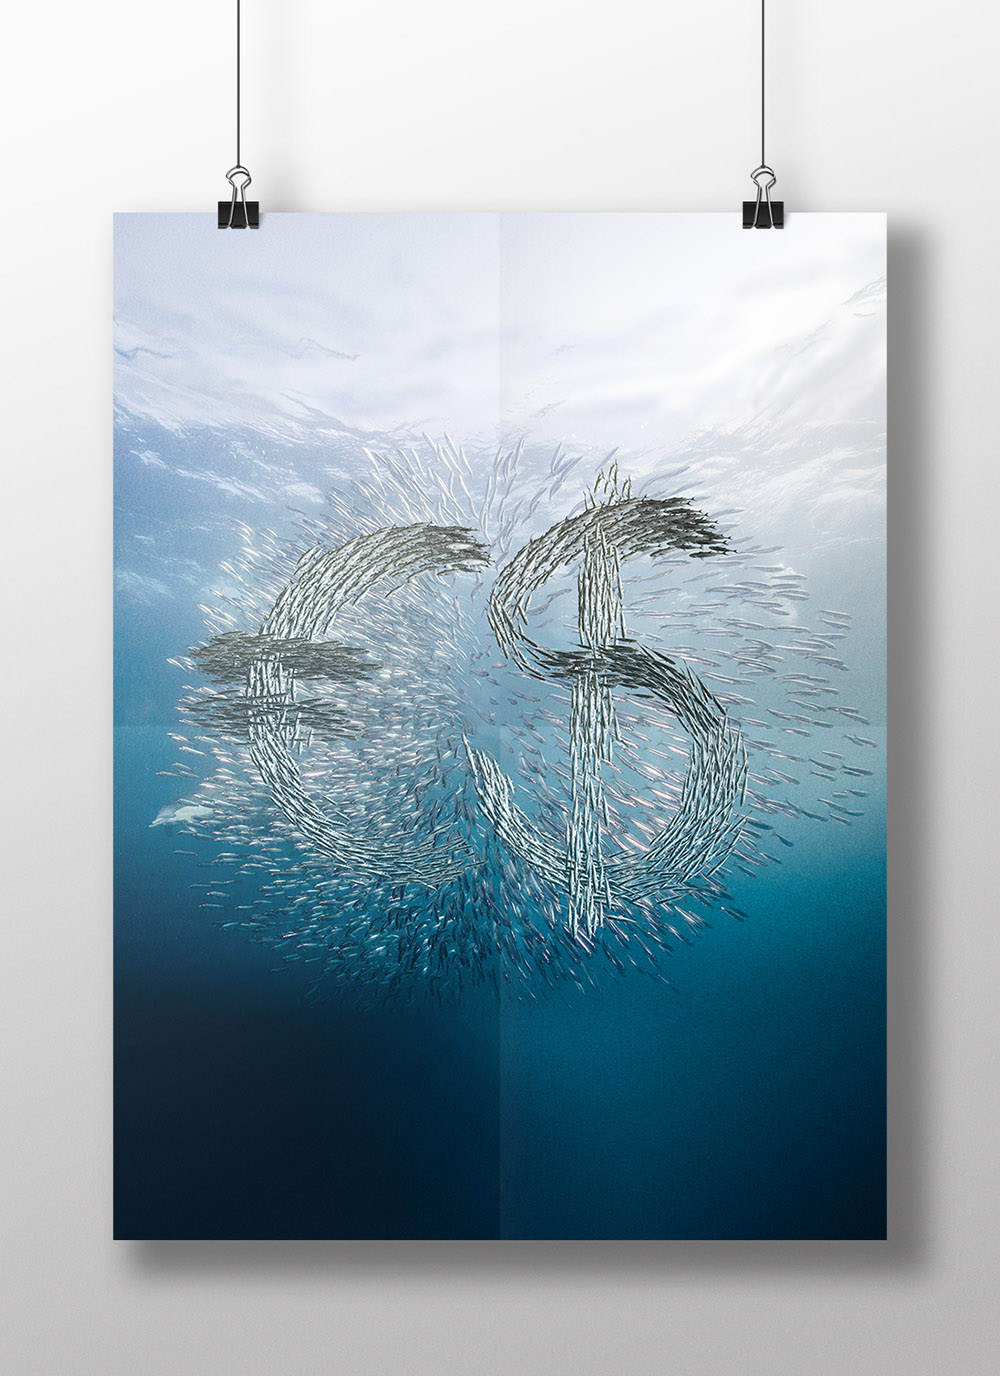 Sucden_fish_poster, Sucden Financial, Form Advertising, brand awareness, advertising, poster